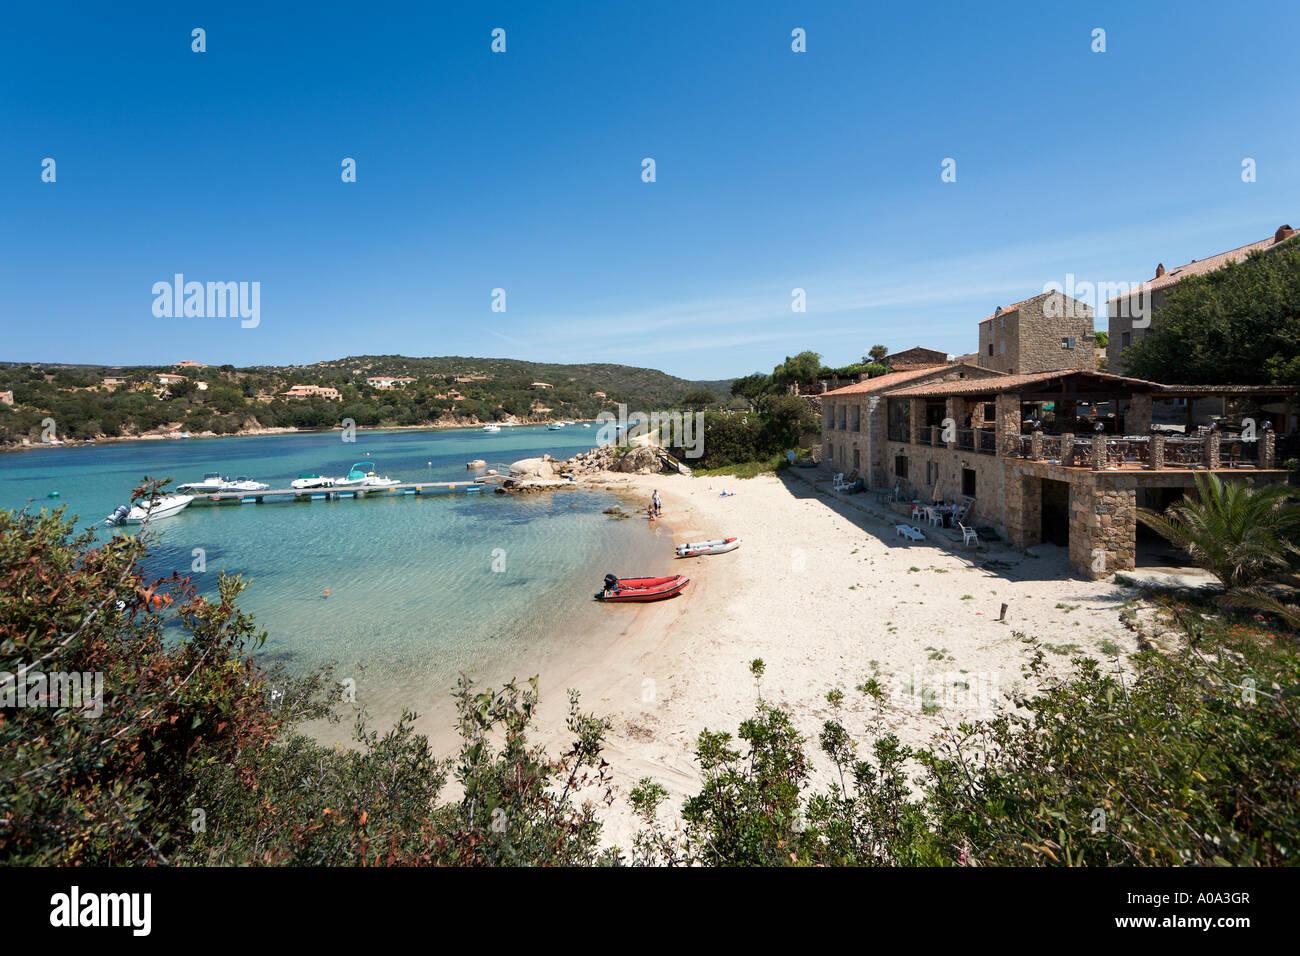 Beach and seafront restaurant in the resort centre, Tizzano, near Sartene, Corsica, France Stock Photo